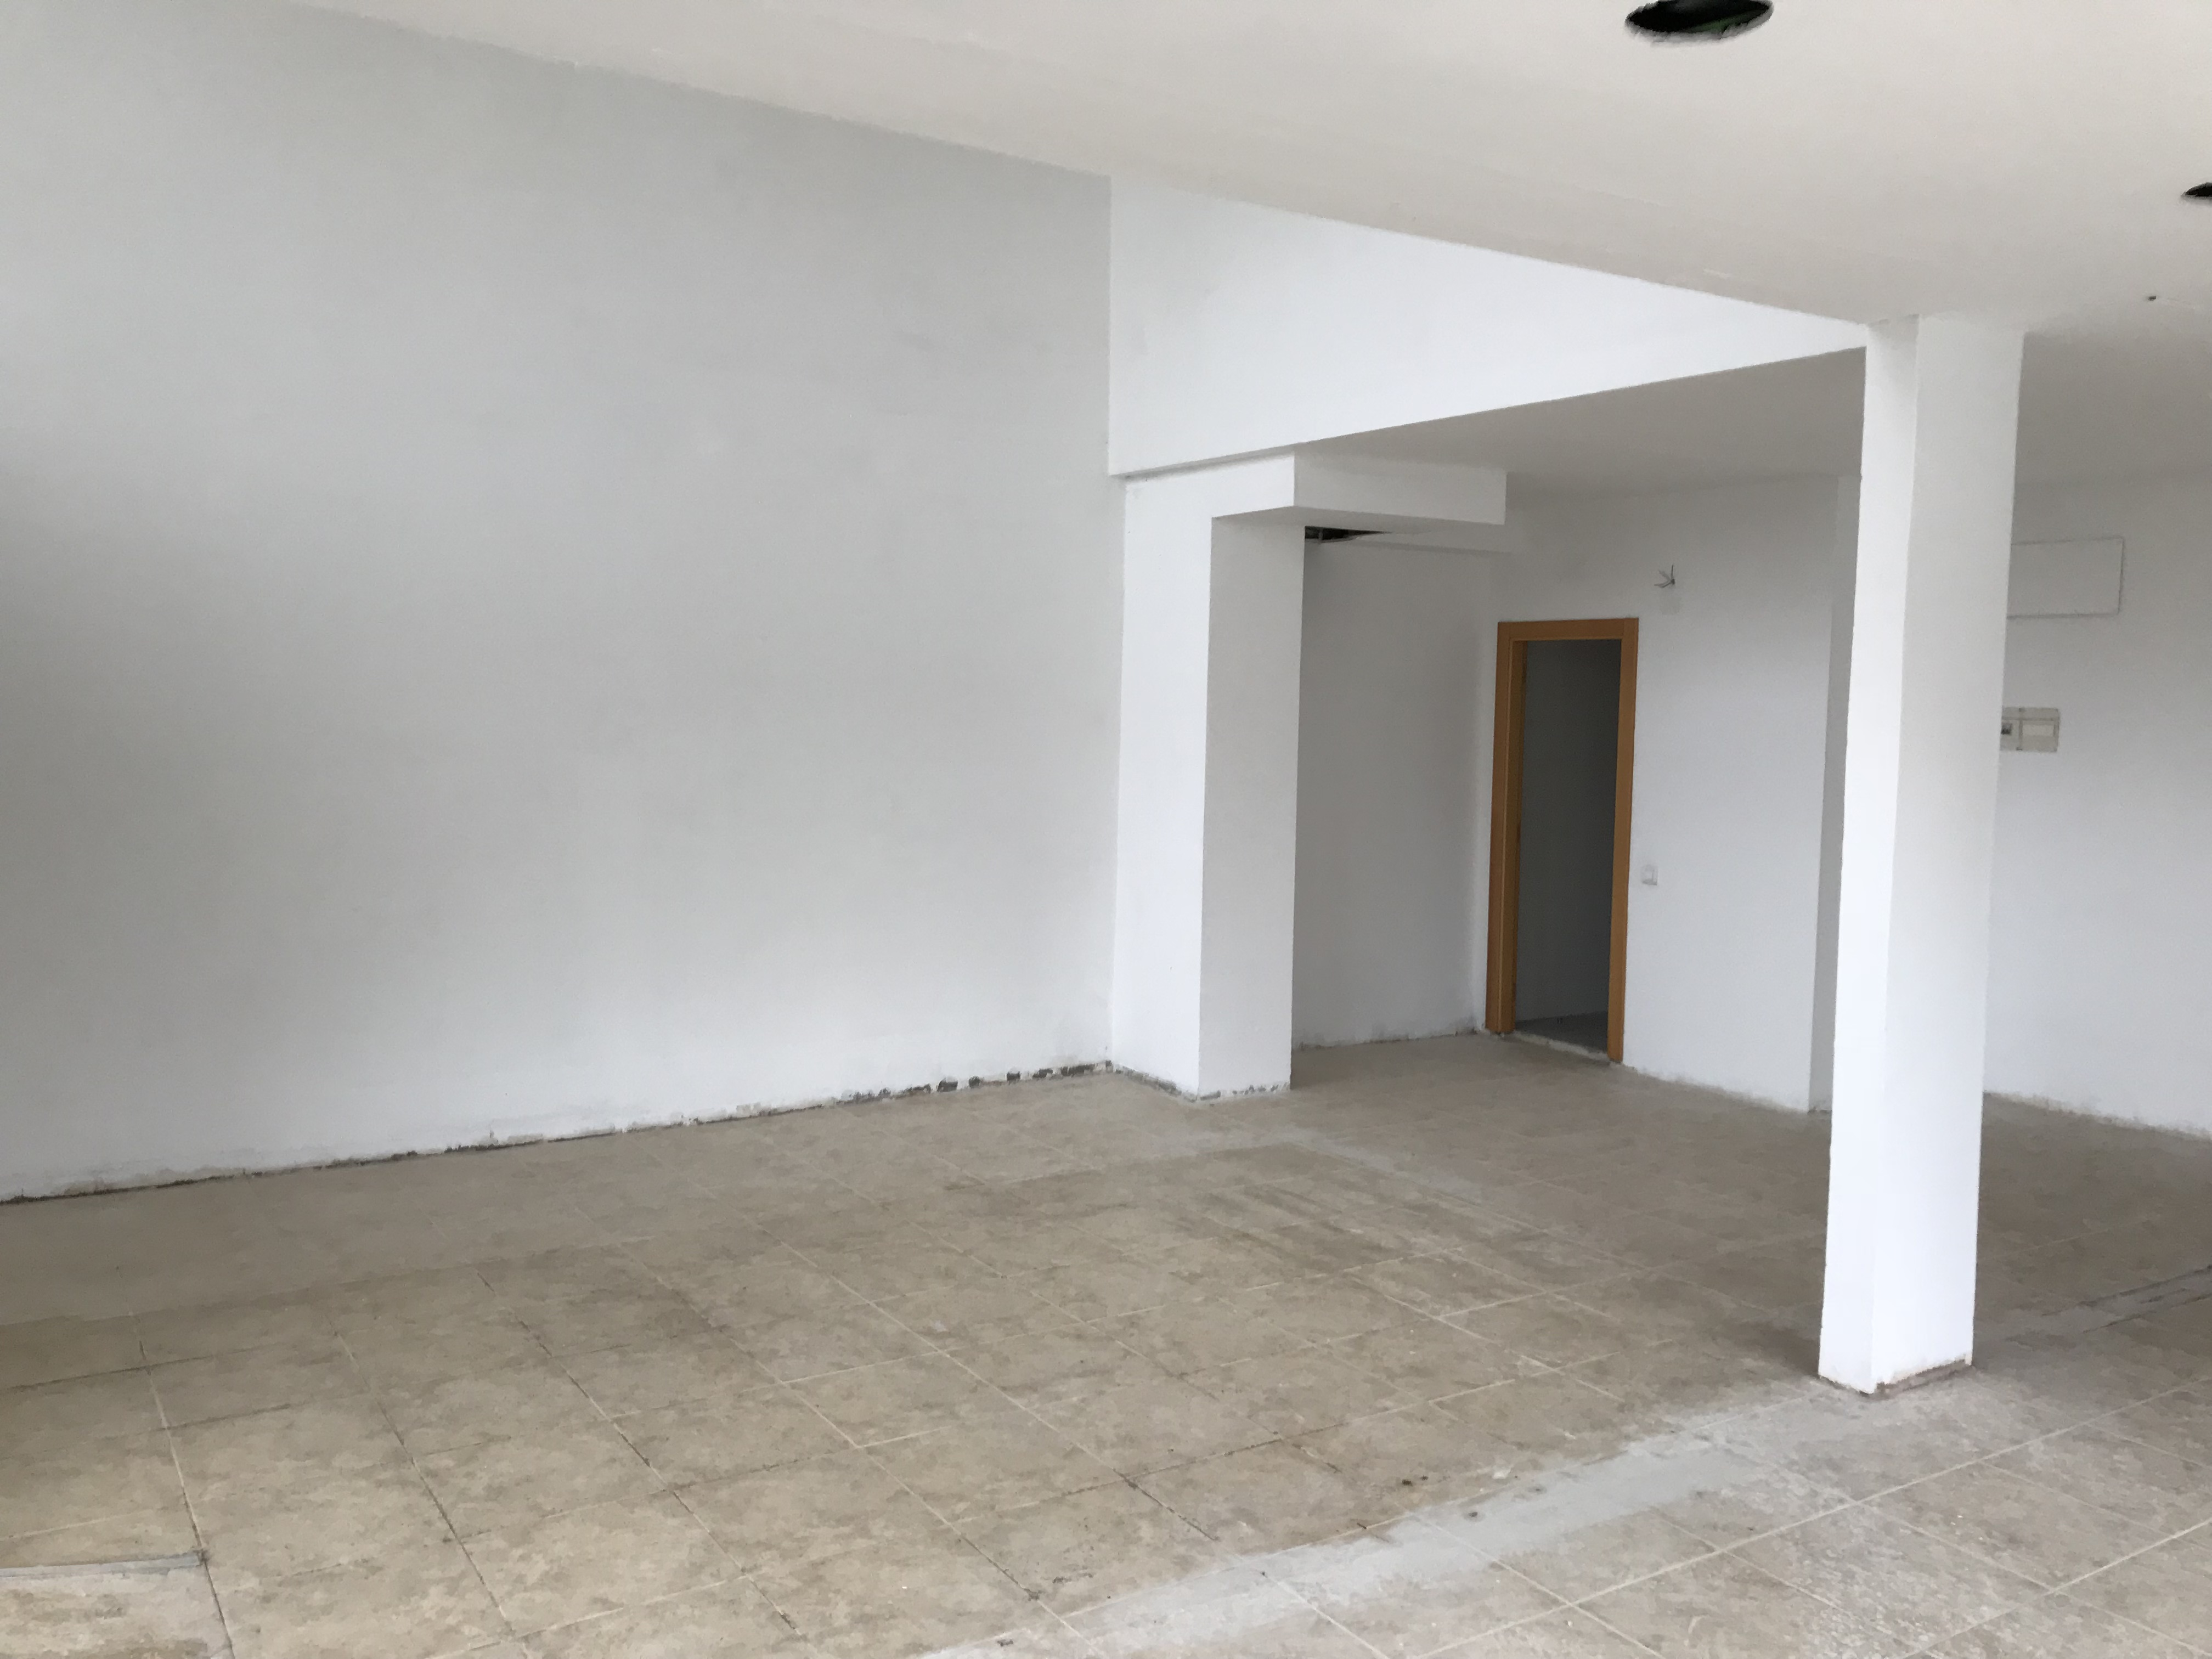 Local en venta en Masia Sant Antoni, Cunit, Tarragona, Calle Costa Daurada, 44.000 €, 72 m2